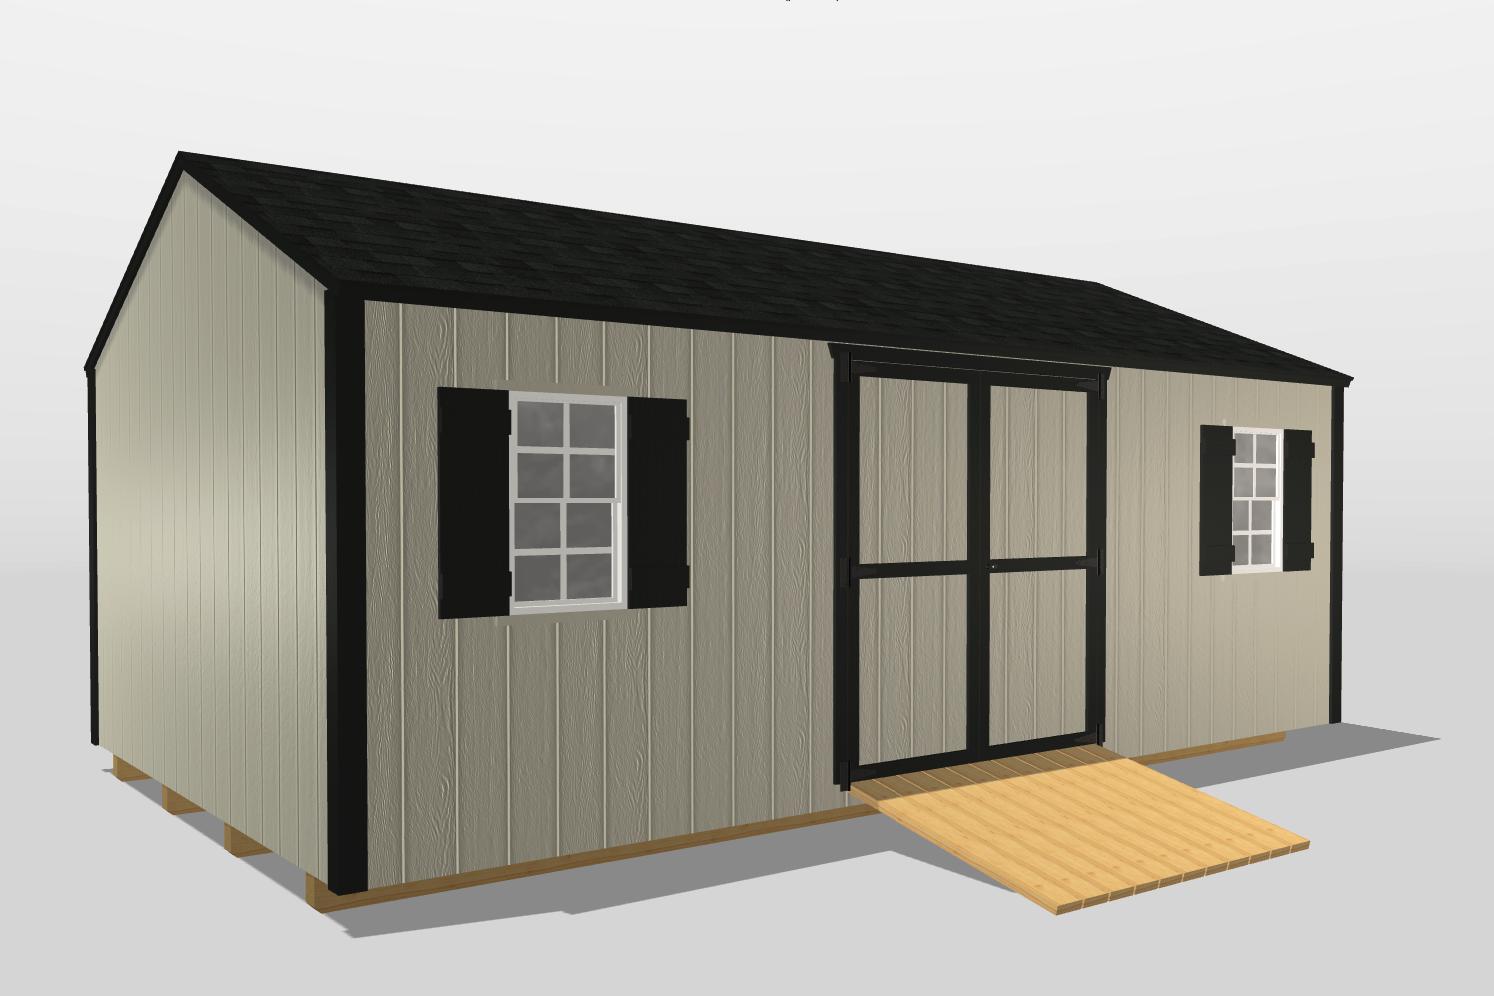 12x20 shed for storage vidalia ga